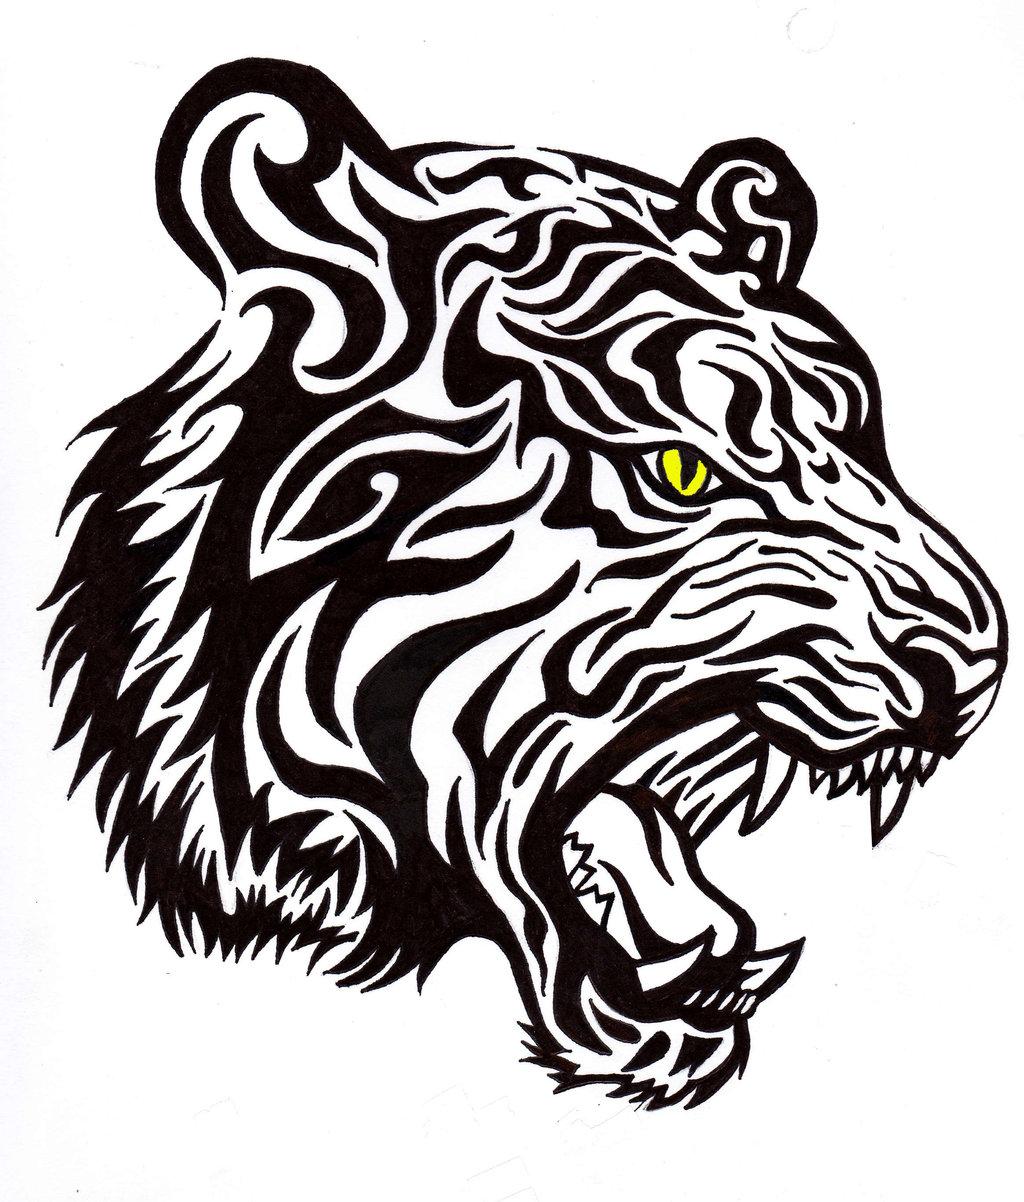 Tatuaggi Tigre Tribale